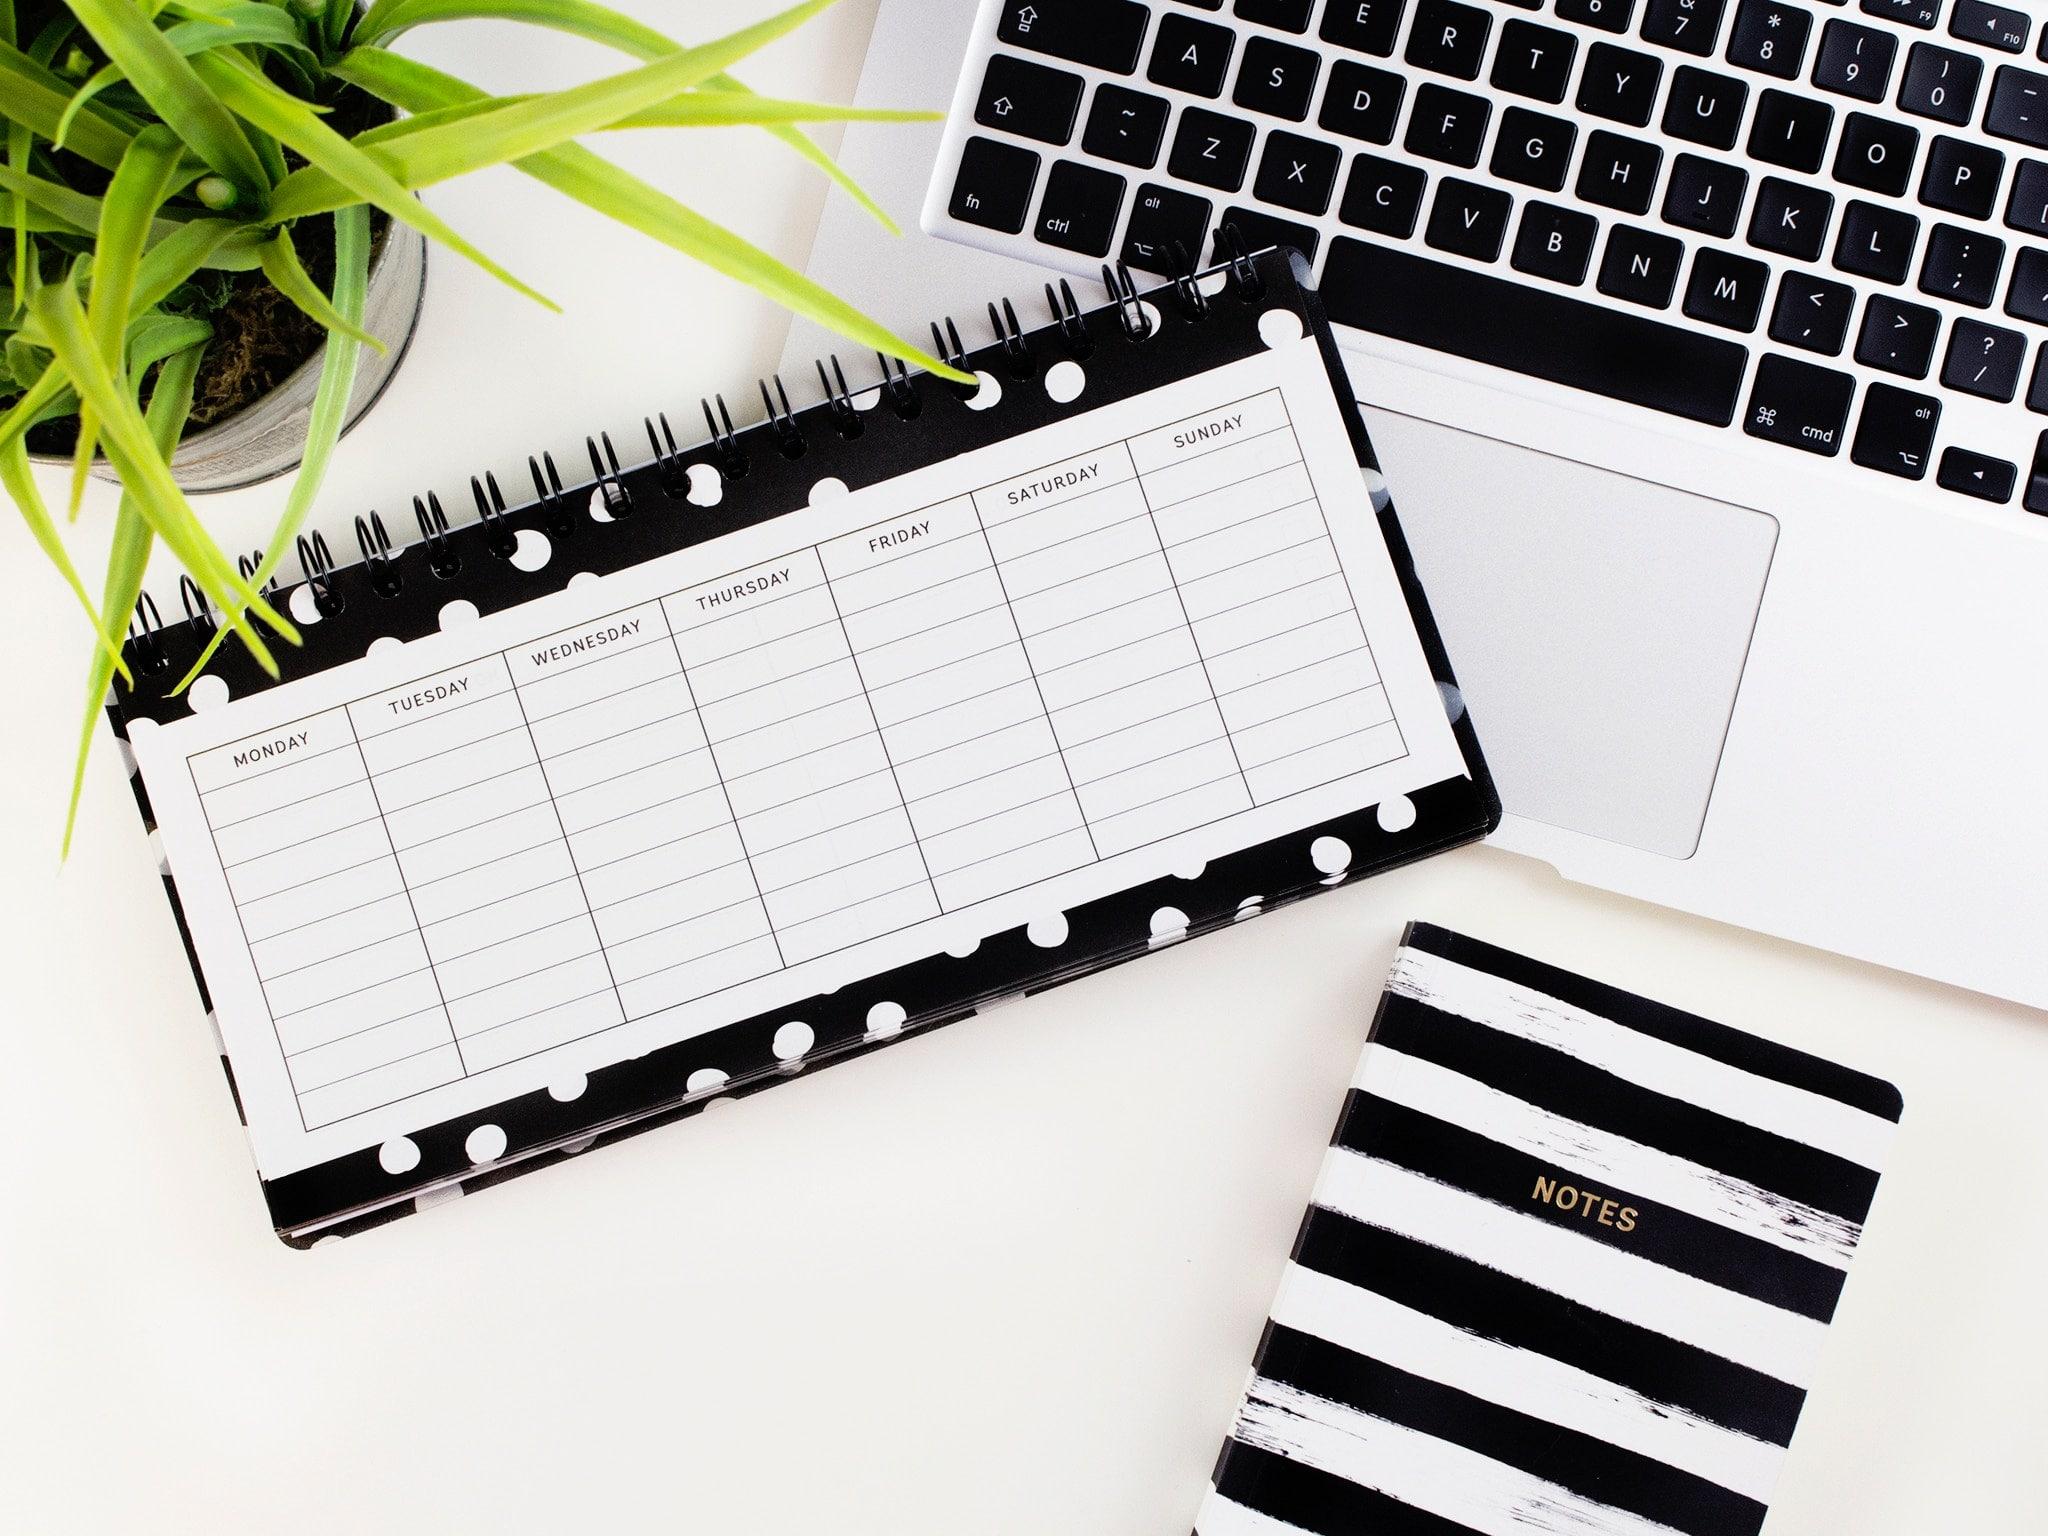 planner, laptop, and calendar